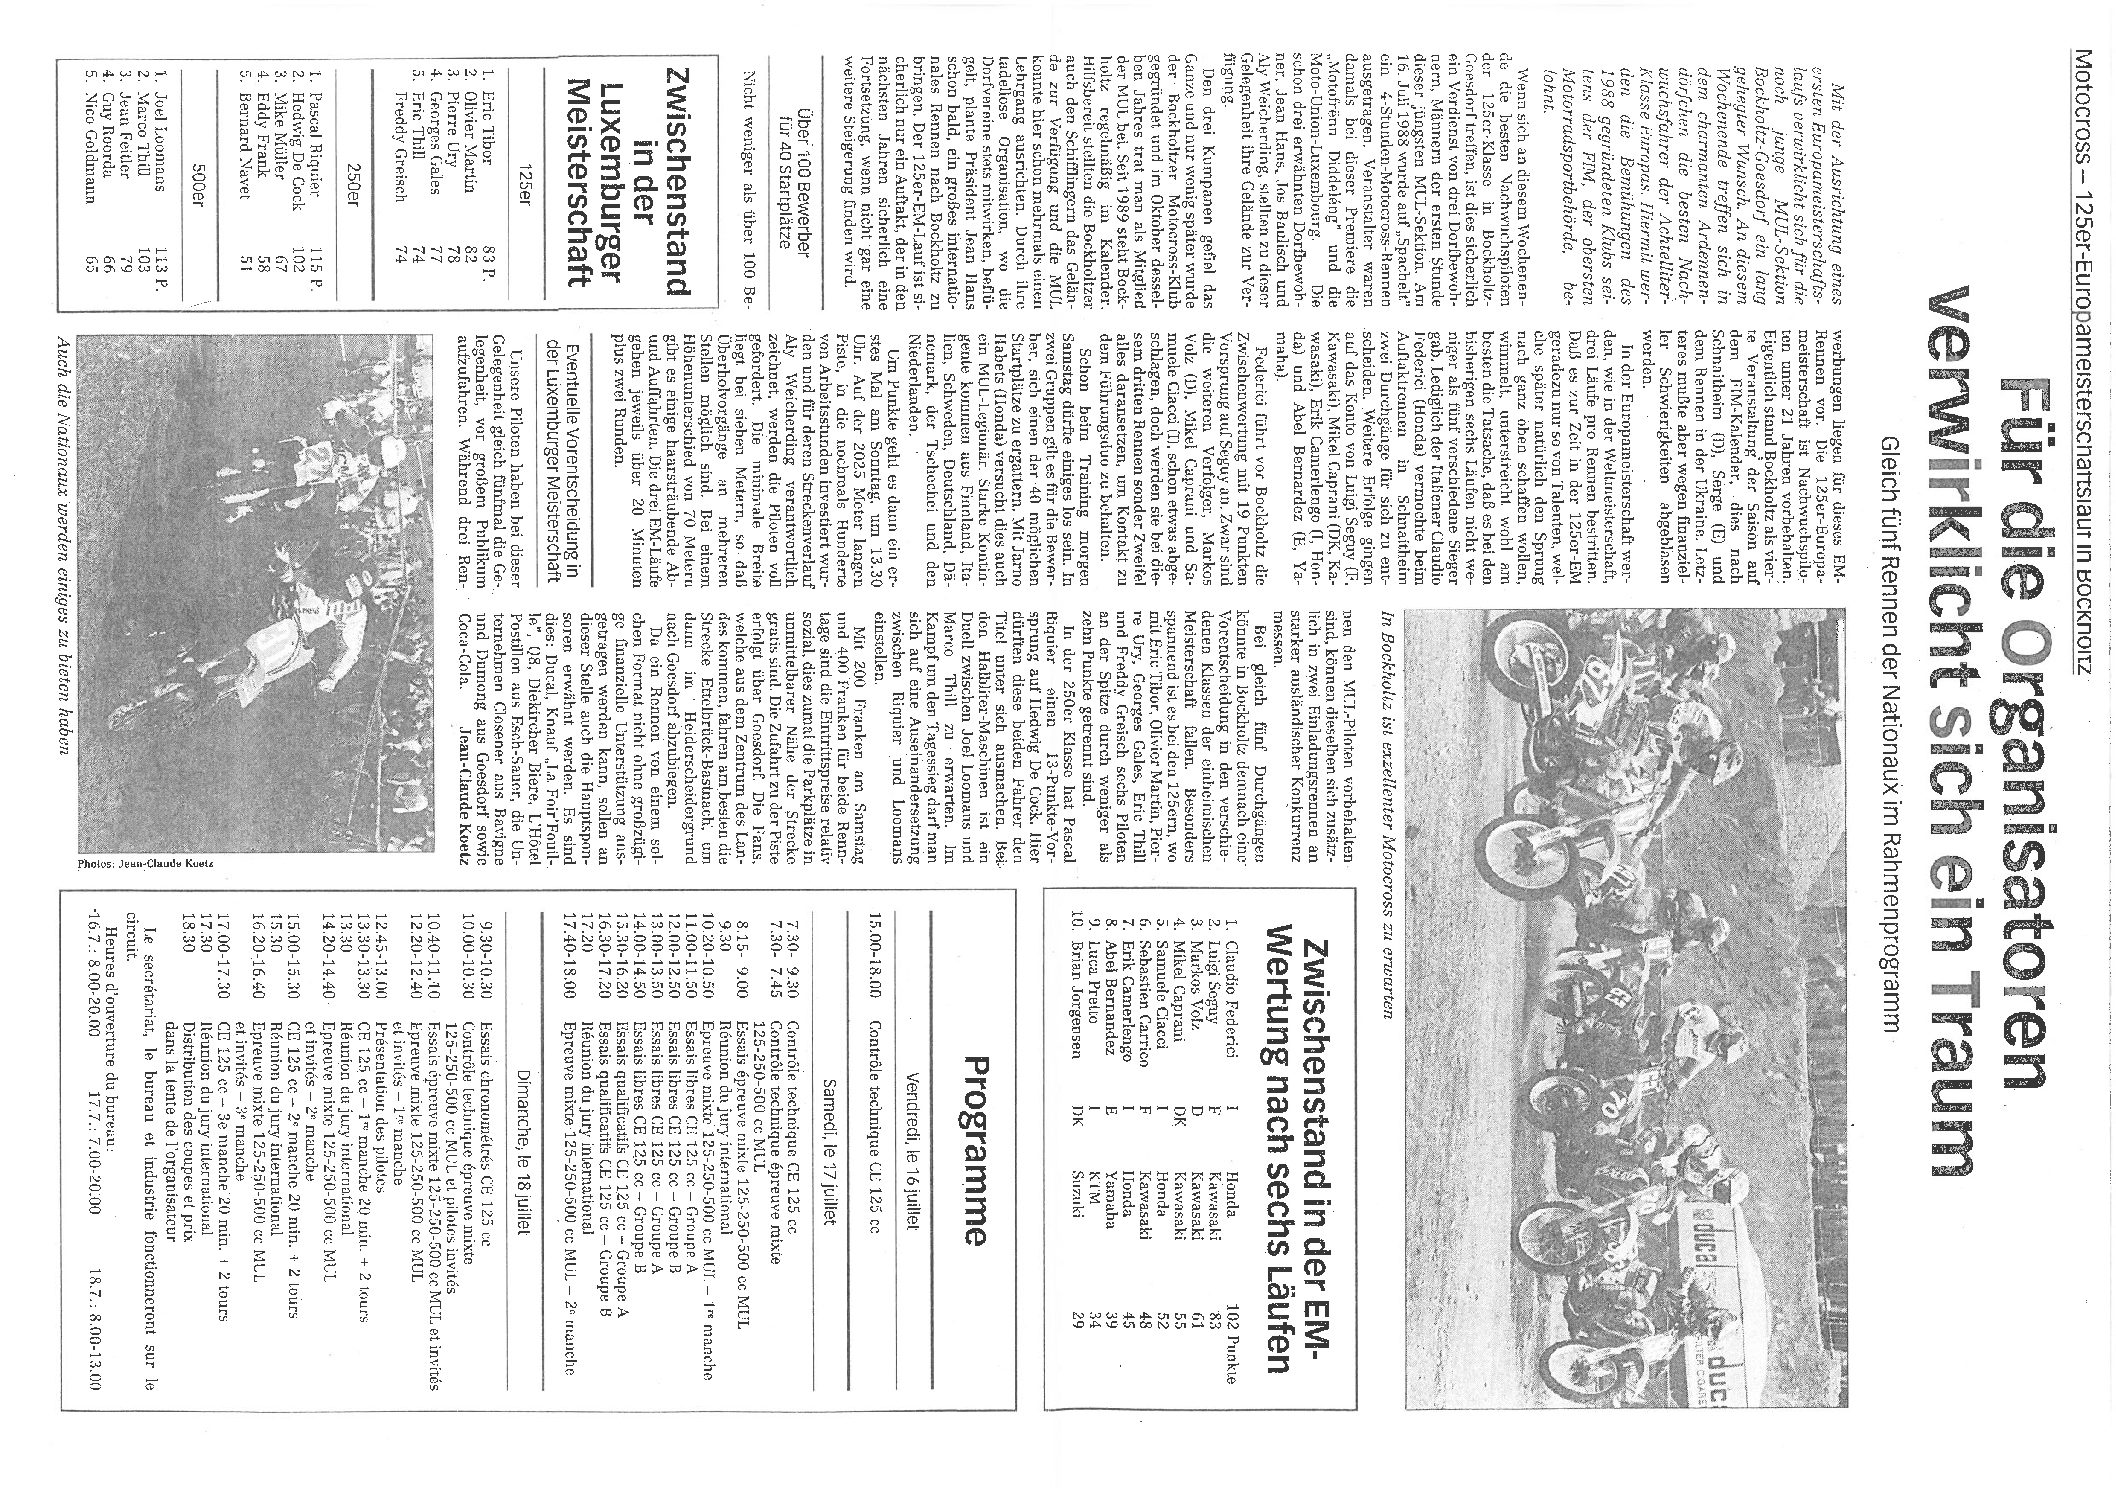 Article 1993 - EM - Jean-Claude Koetz